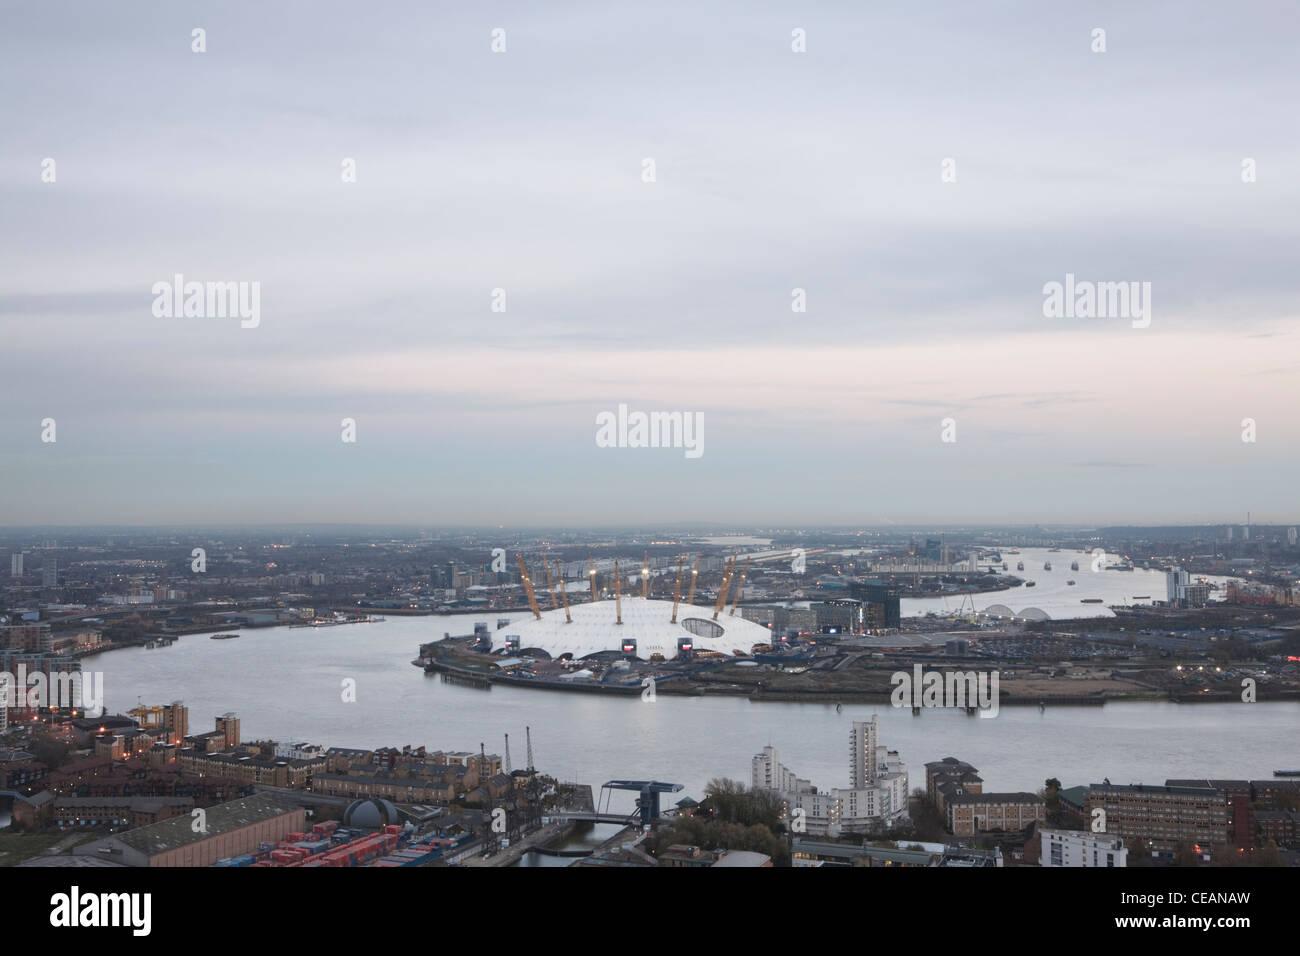 River Thames, The O2 Arena East, London, England Stock Photo